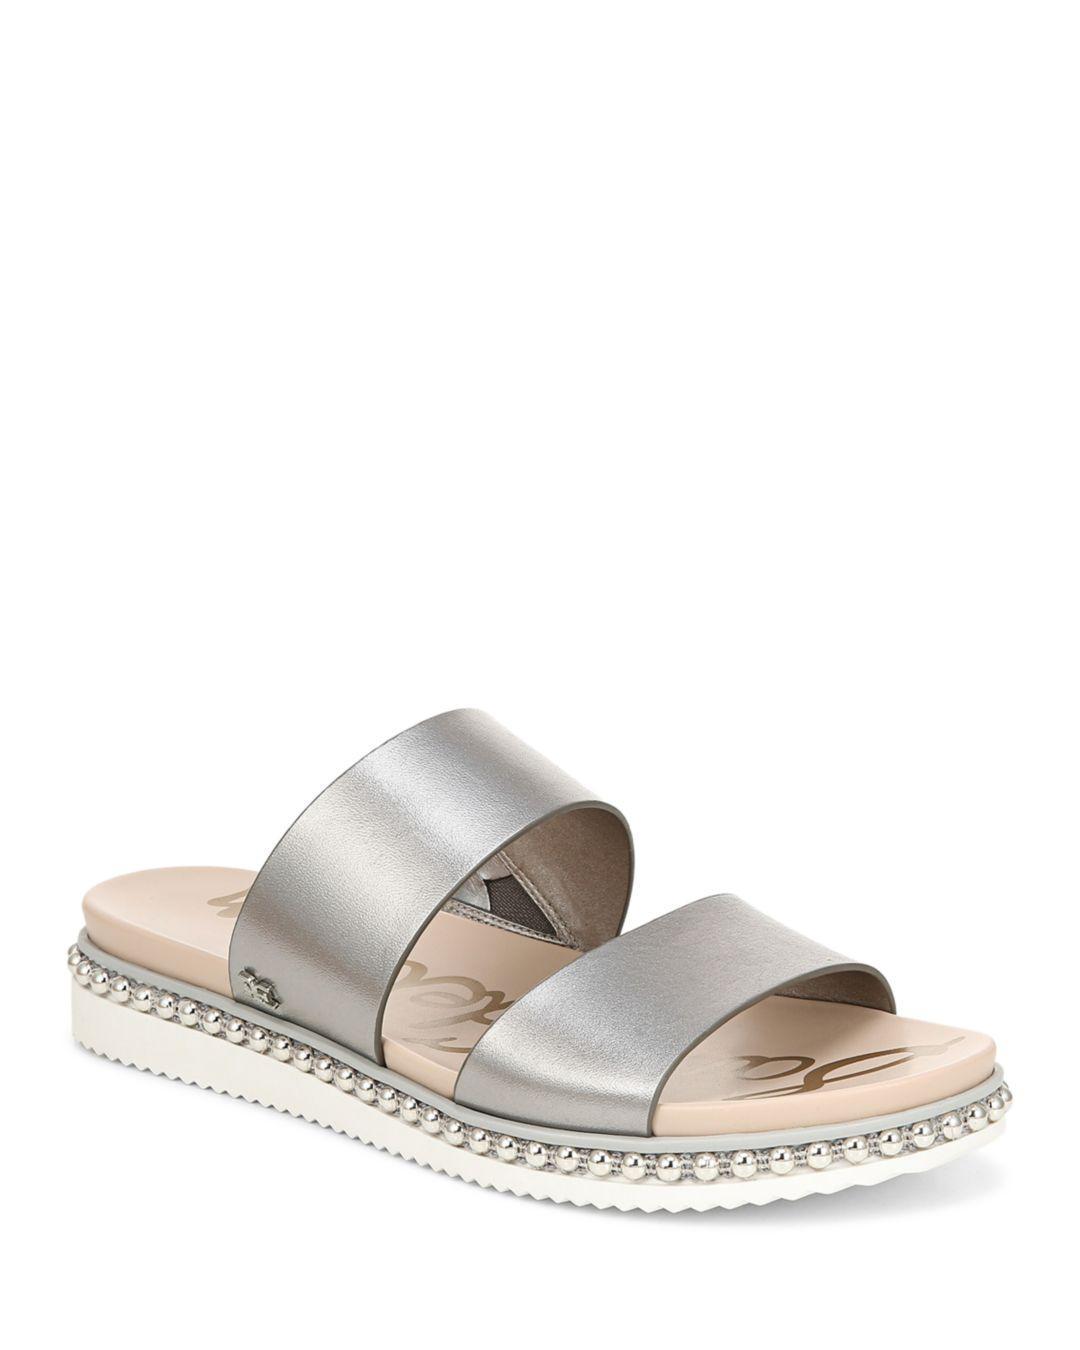 21c0083bb36d Lyst - Sam Edelman Women s Asha Studded Leather Slide Sandals - Save 26%